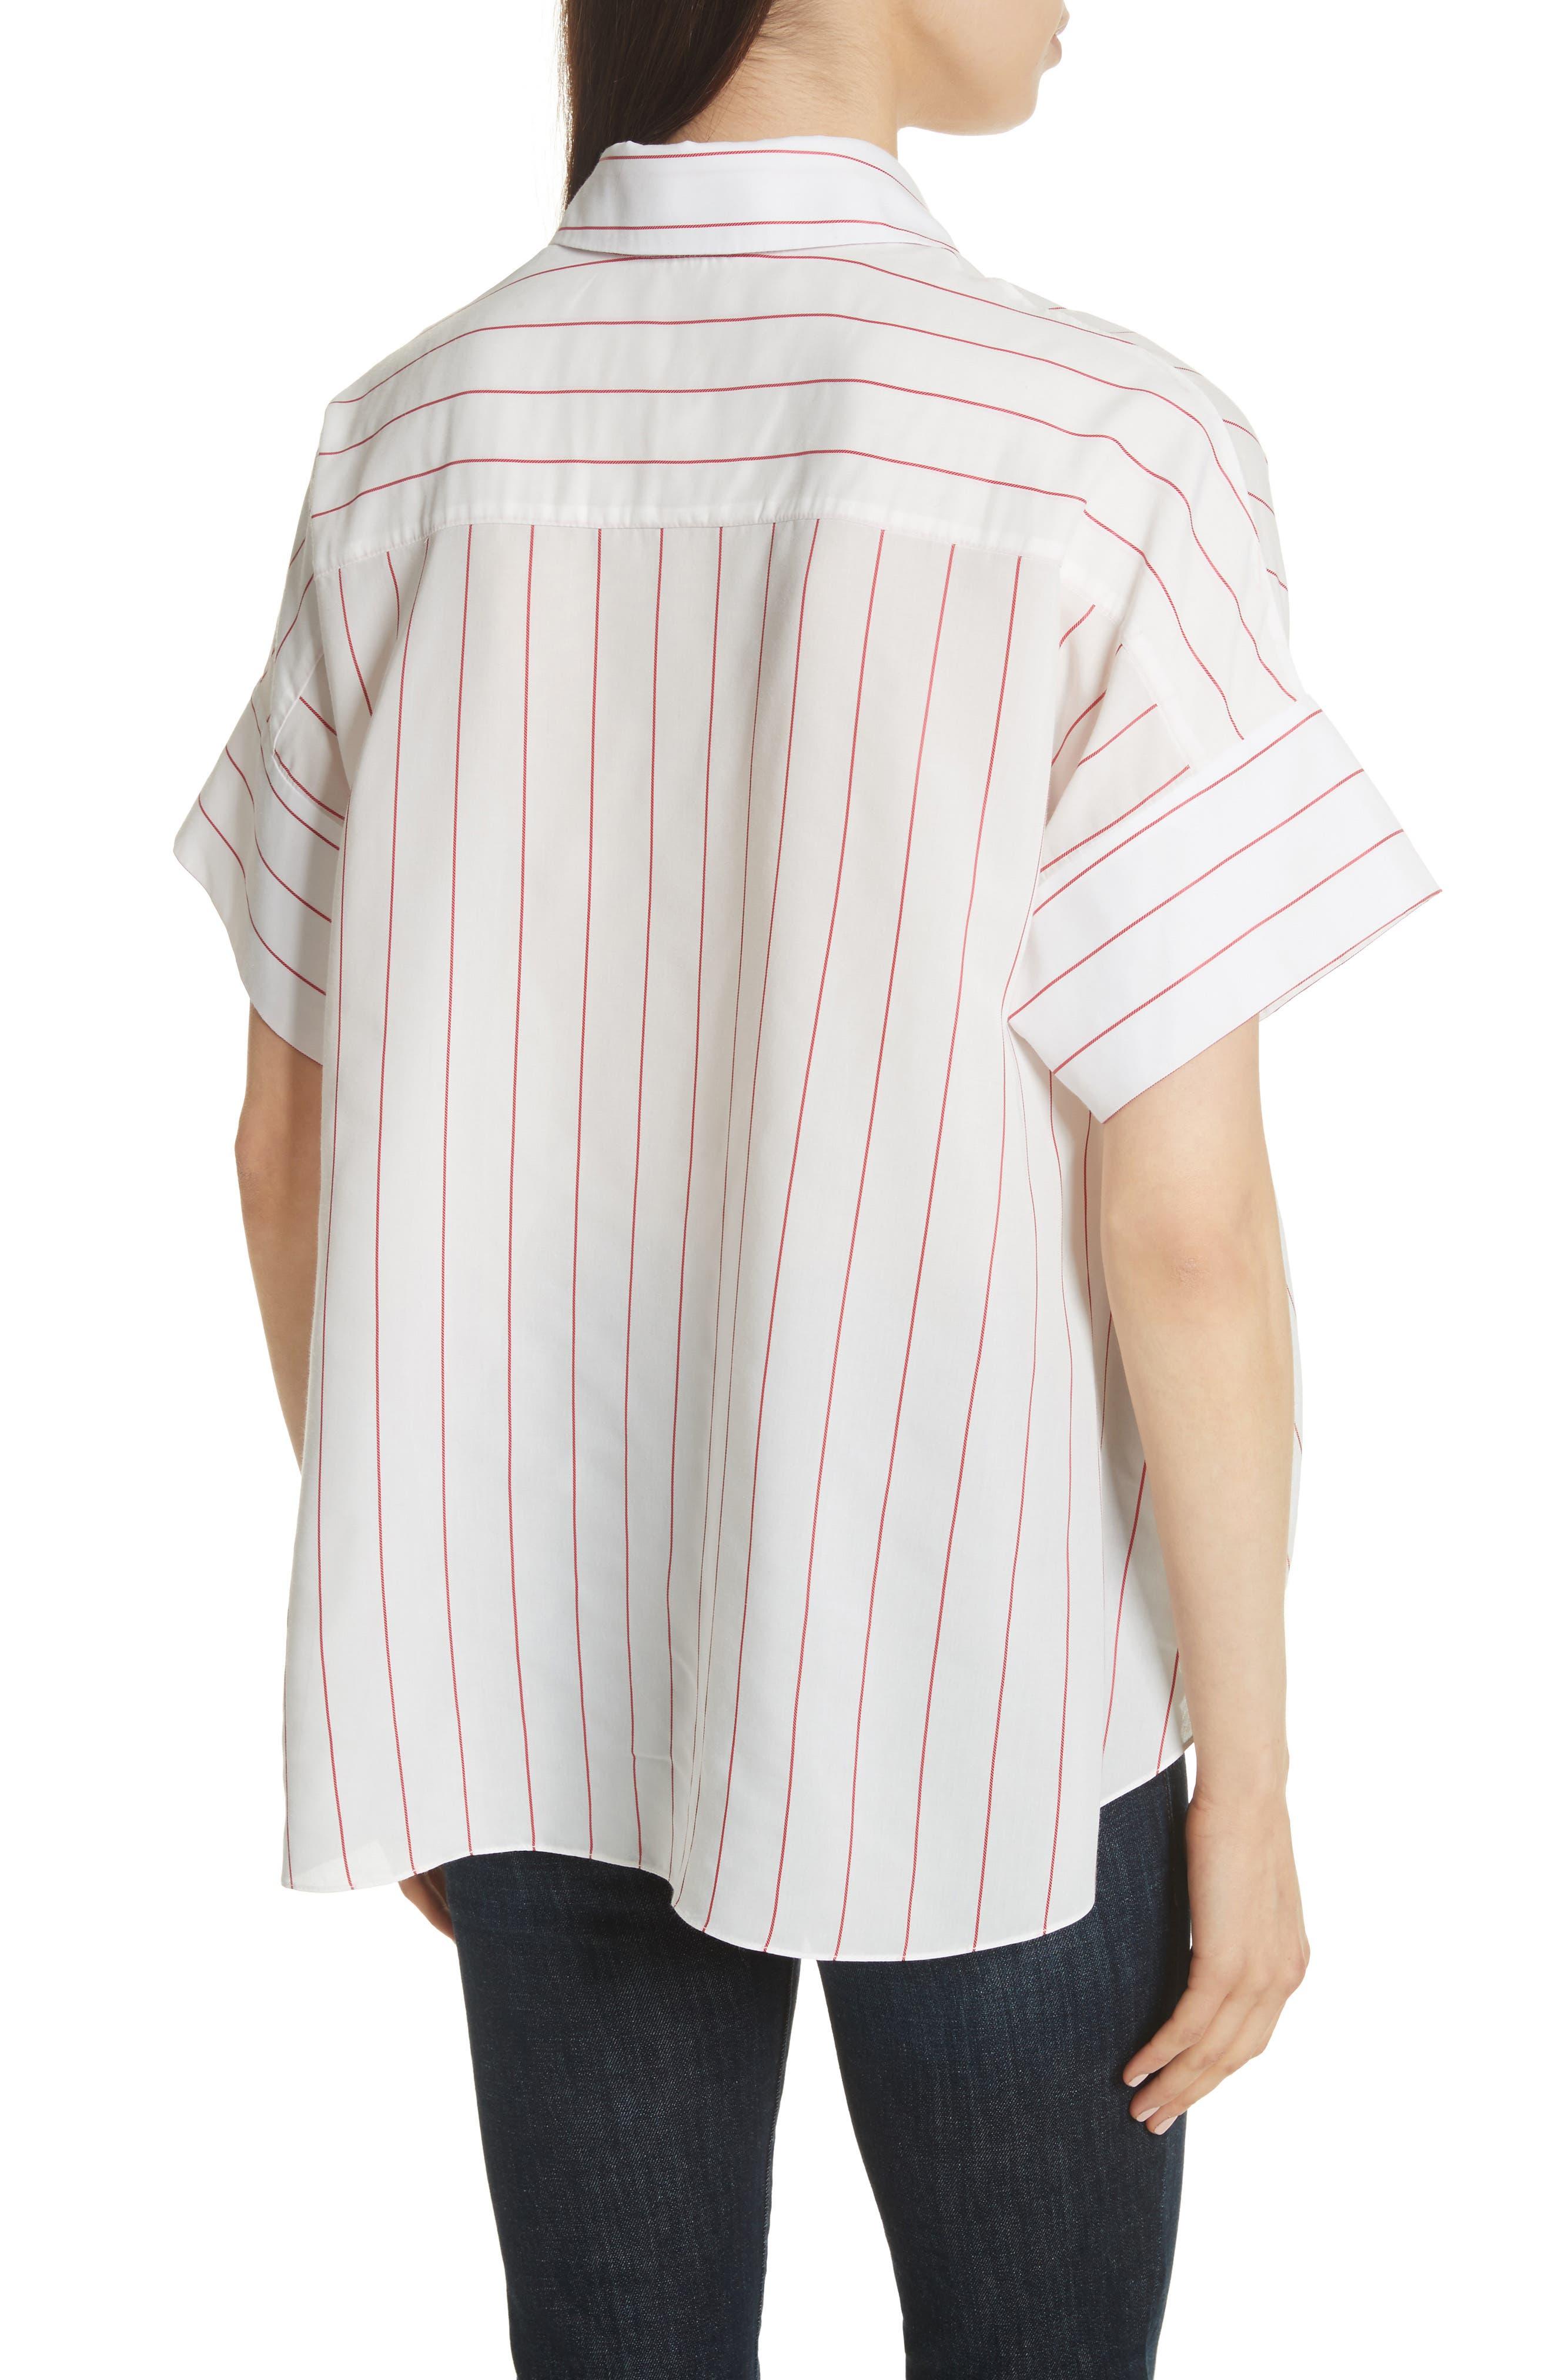 Edyth High/Low Button Down Shirt,                             Alternate thumbnail 2, color,                             134